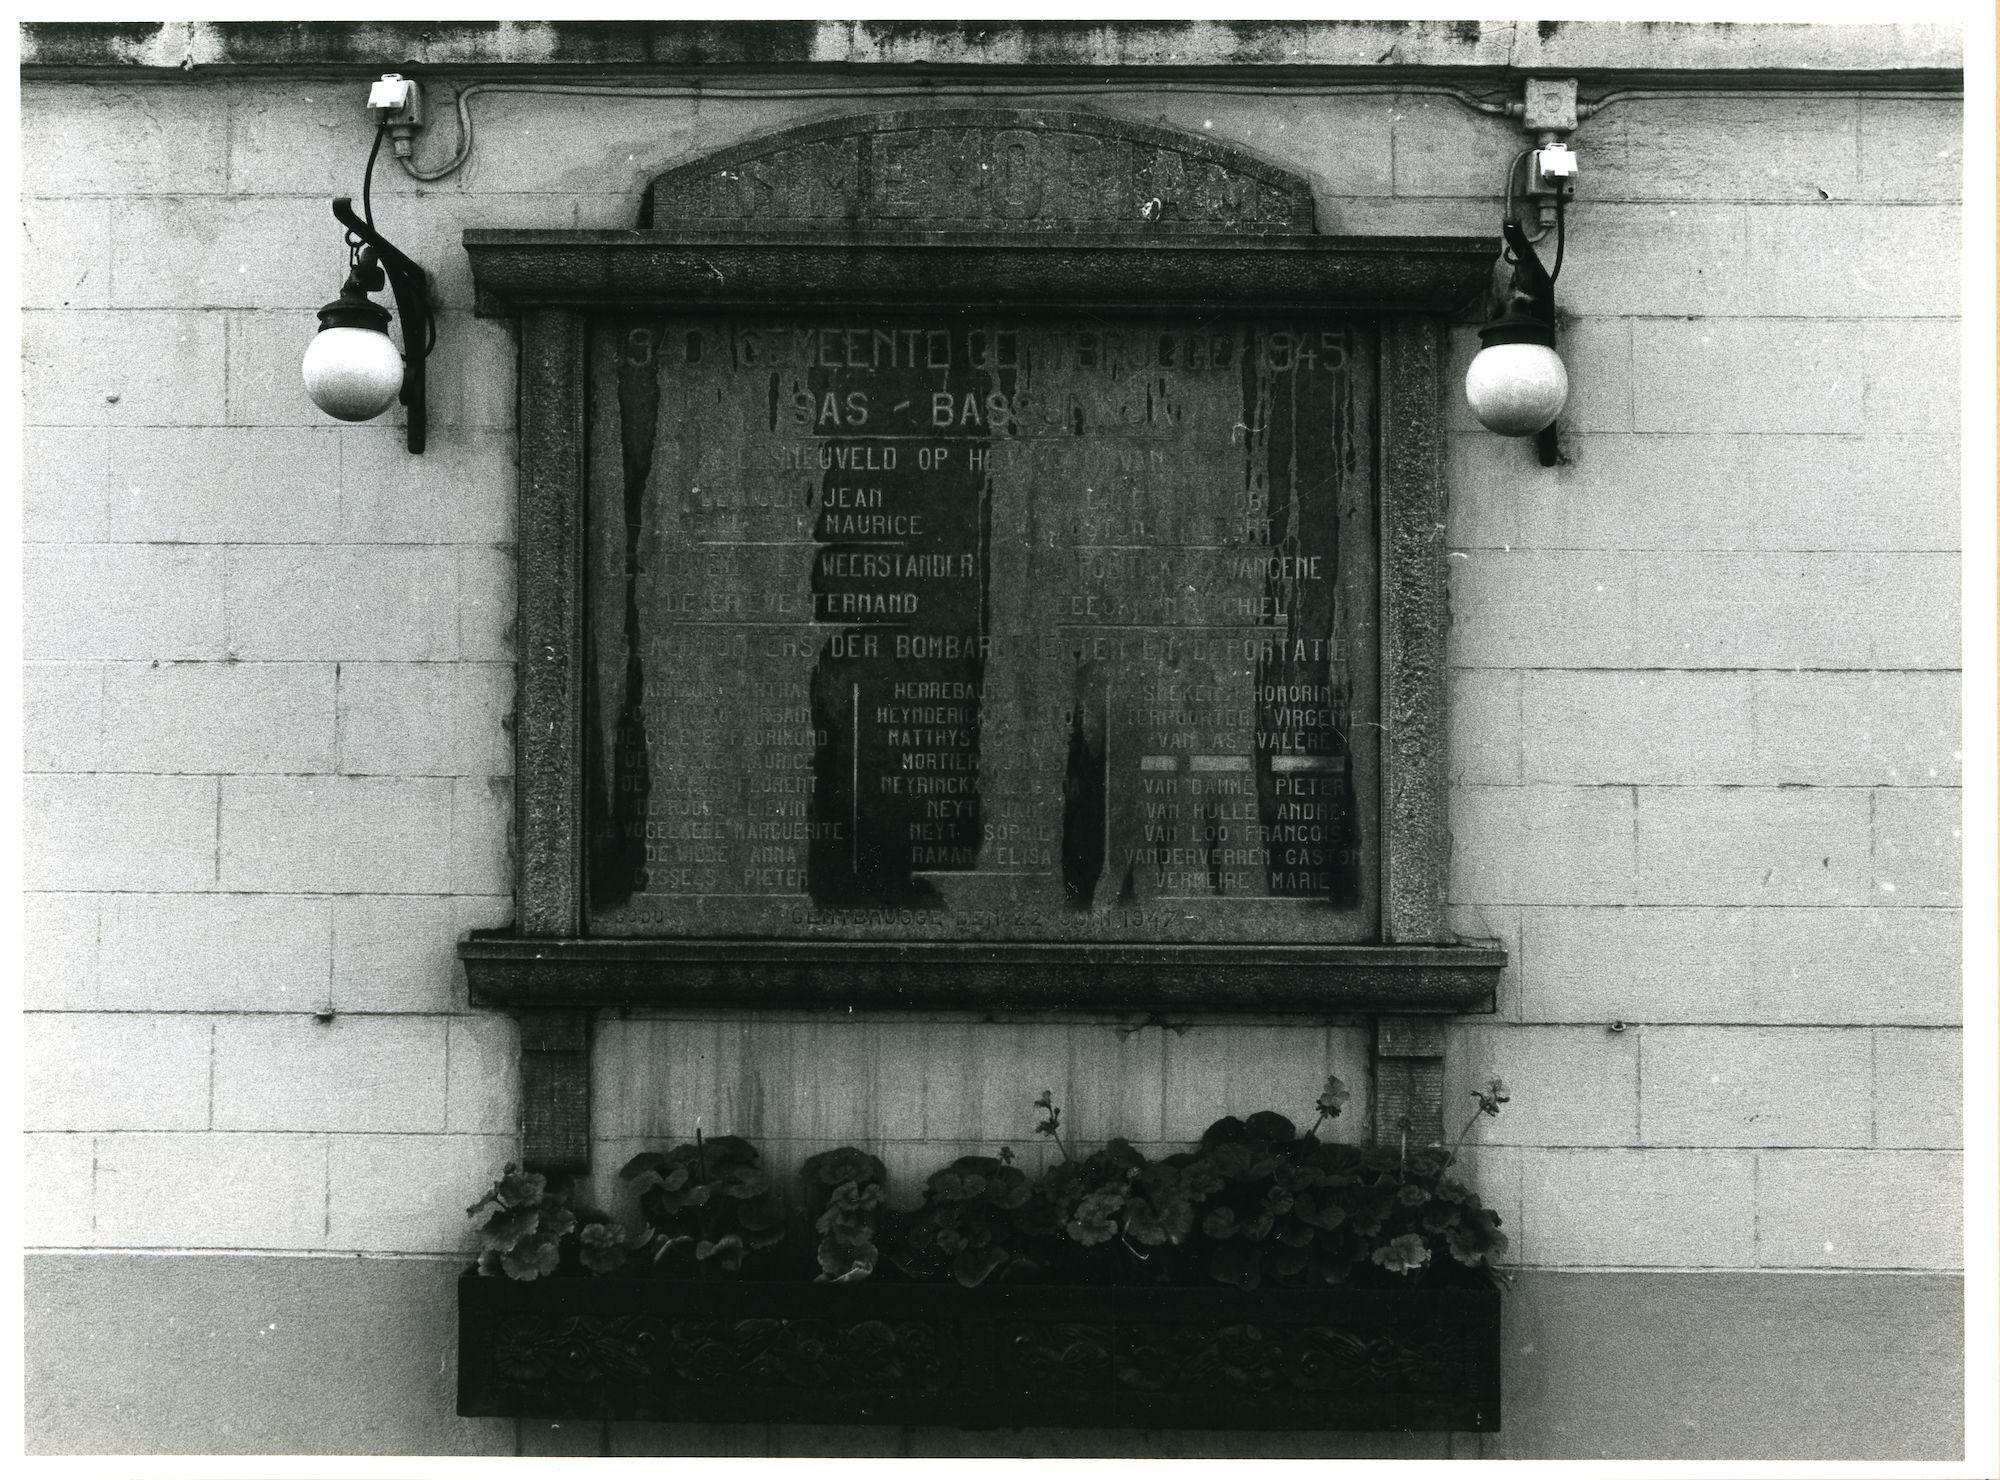 Gentbrugge: Kerkstraat 263: Gedenksteen WO II, 1980